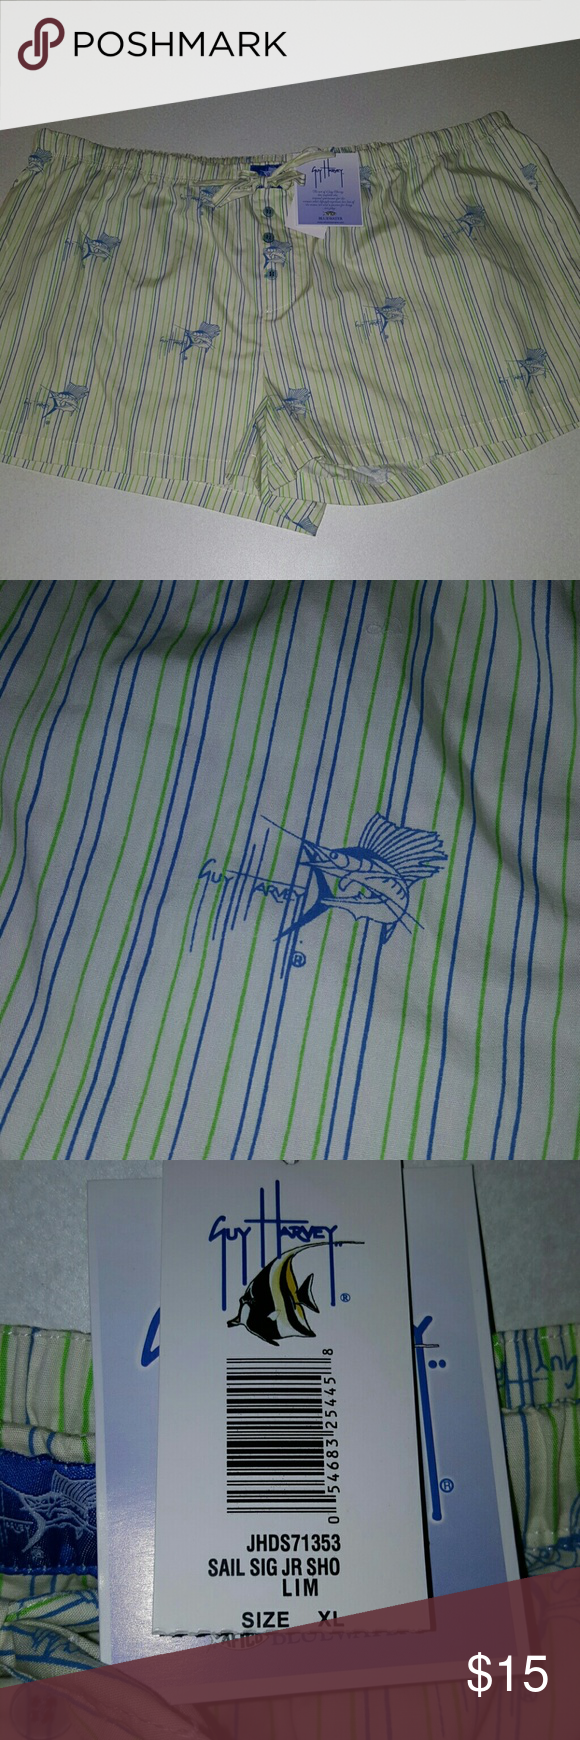 Guy Harvey Lounge Shorts Cute striped Marlin sleep/lounge shorts. White with green/blue stripes. Guy Harvey Intimates & Sleepwear Pajamas